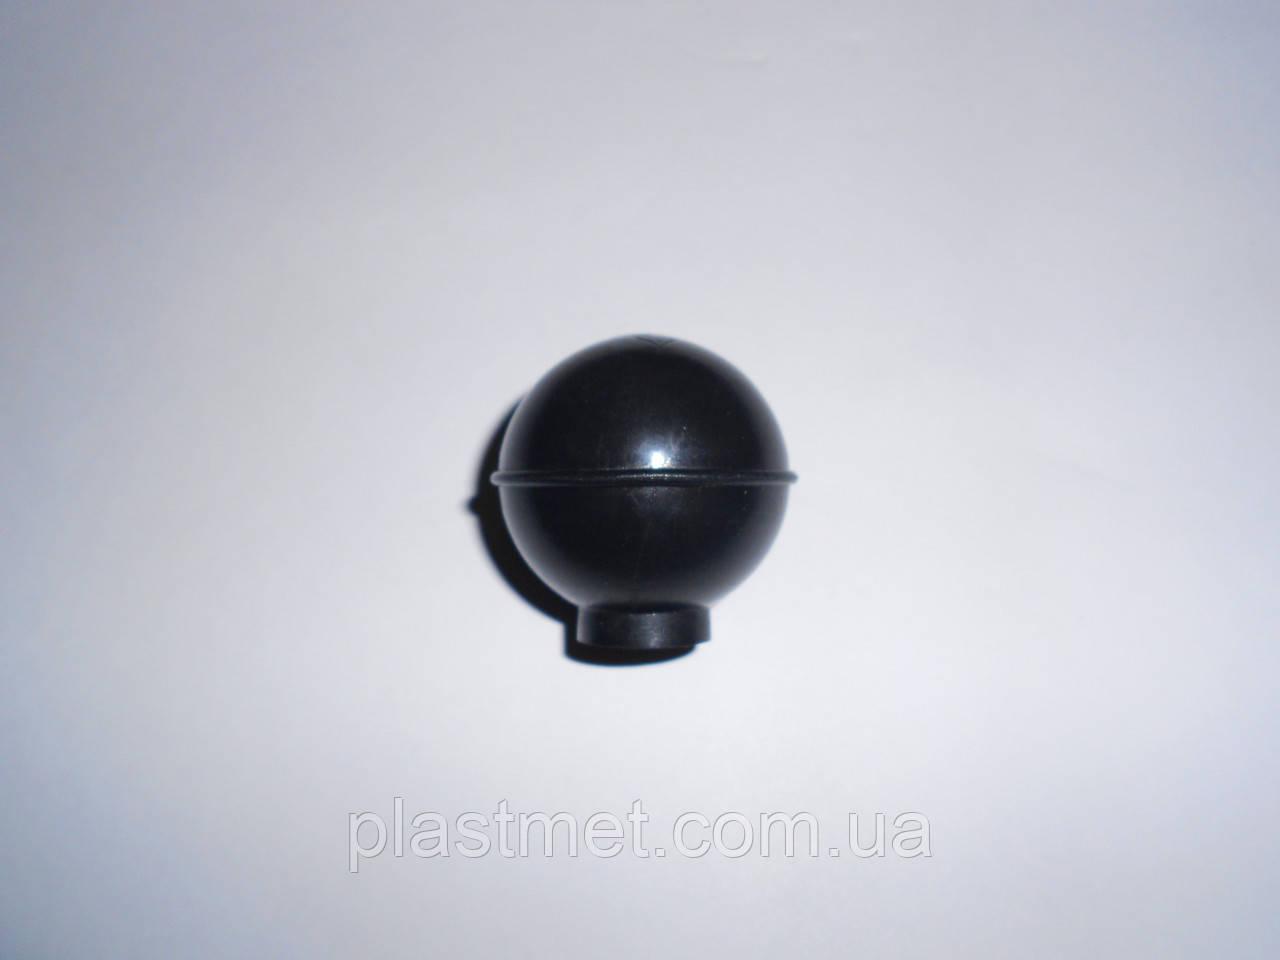 Ручка універсальна 41 мм